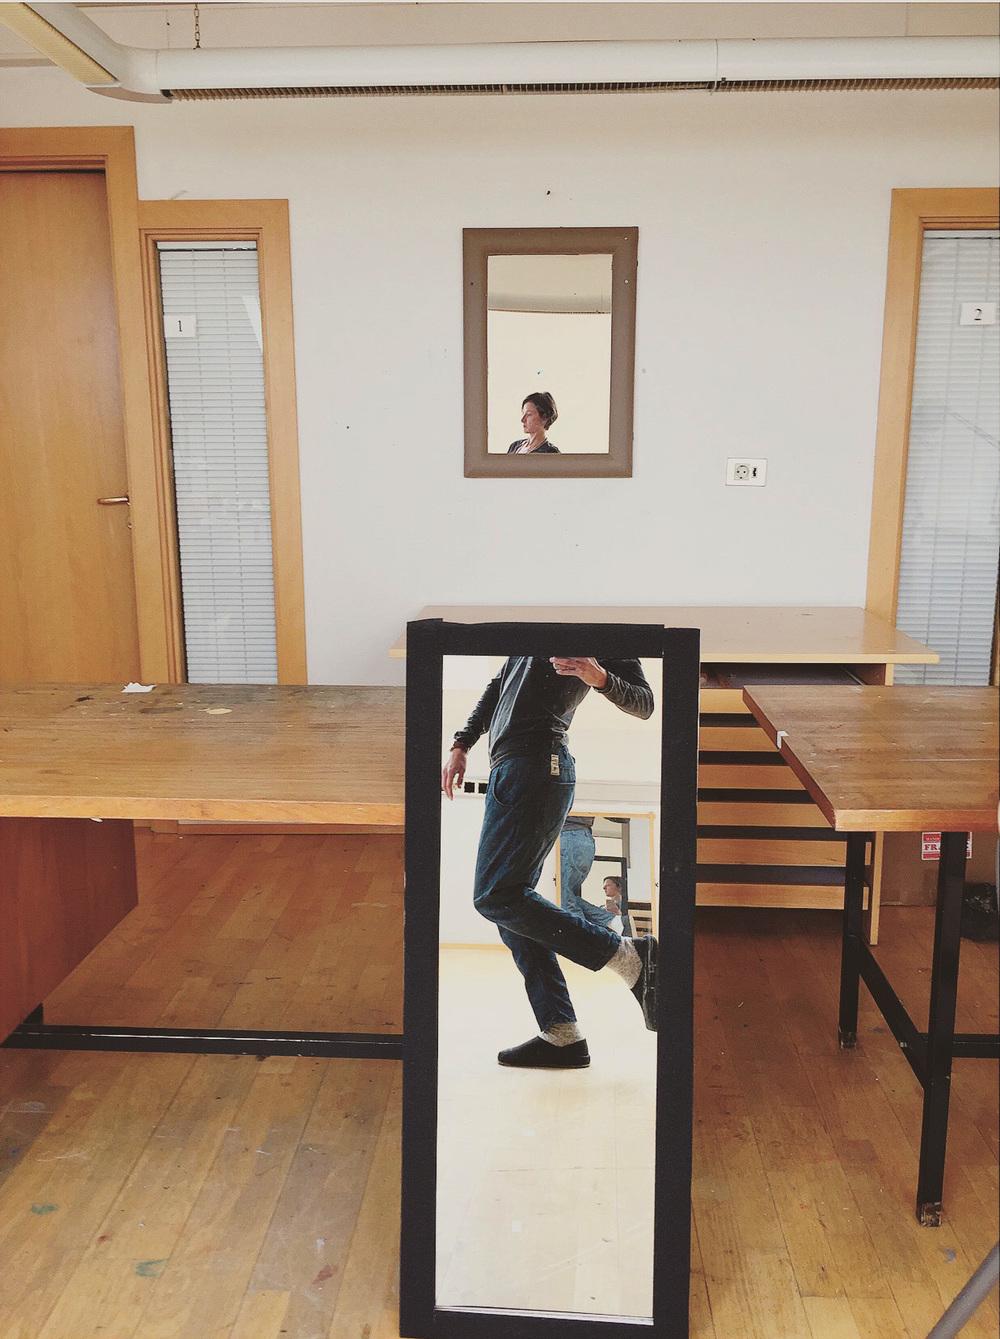 Untitled: Selfie,Archival Inkjet Print, 2015